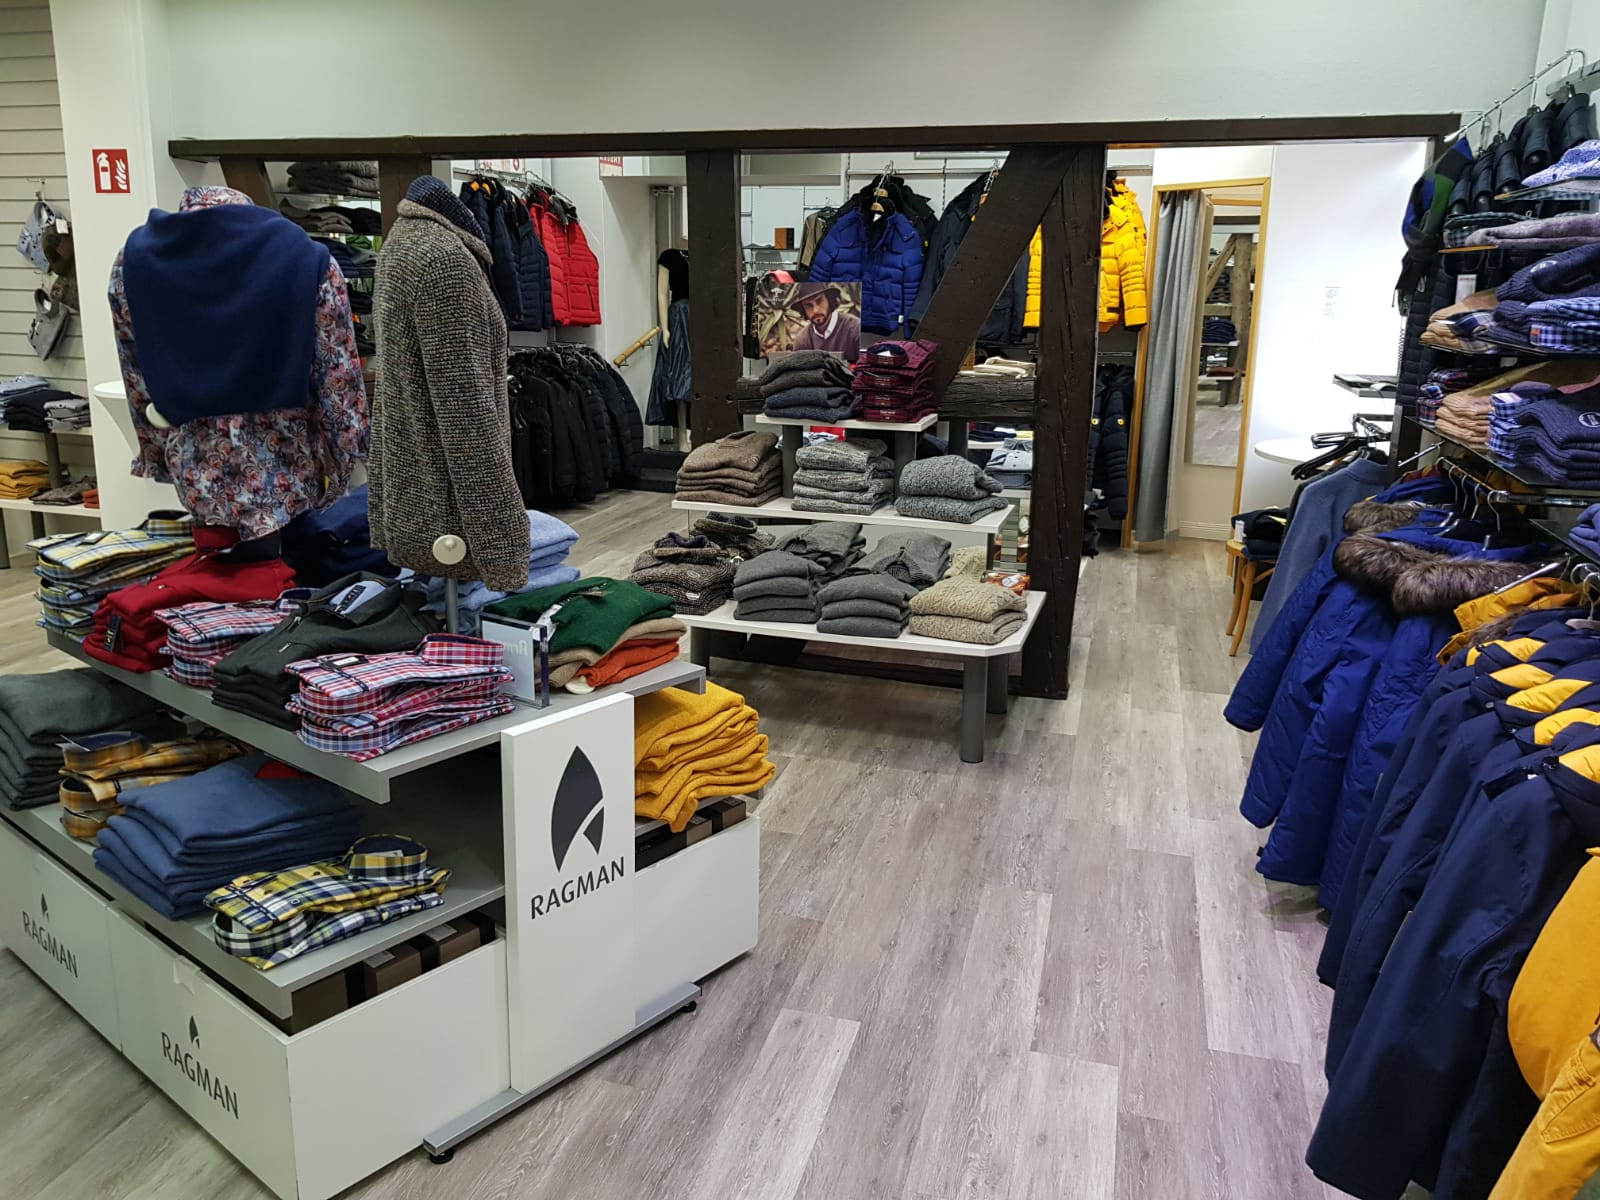 celle-shopping-rudel-kleidung-5.jpg